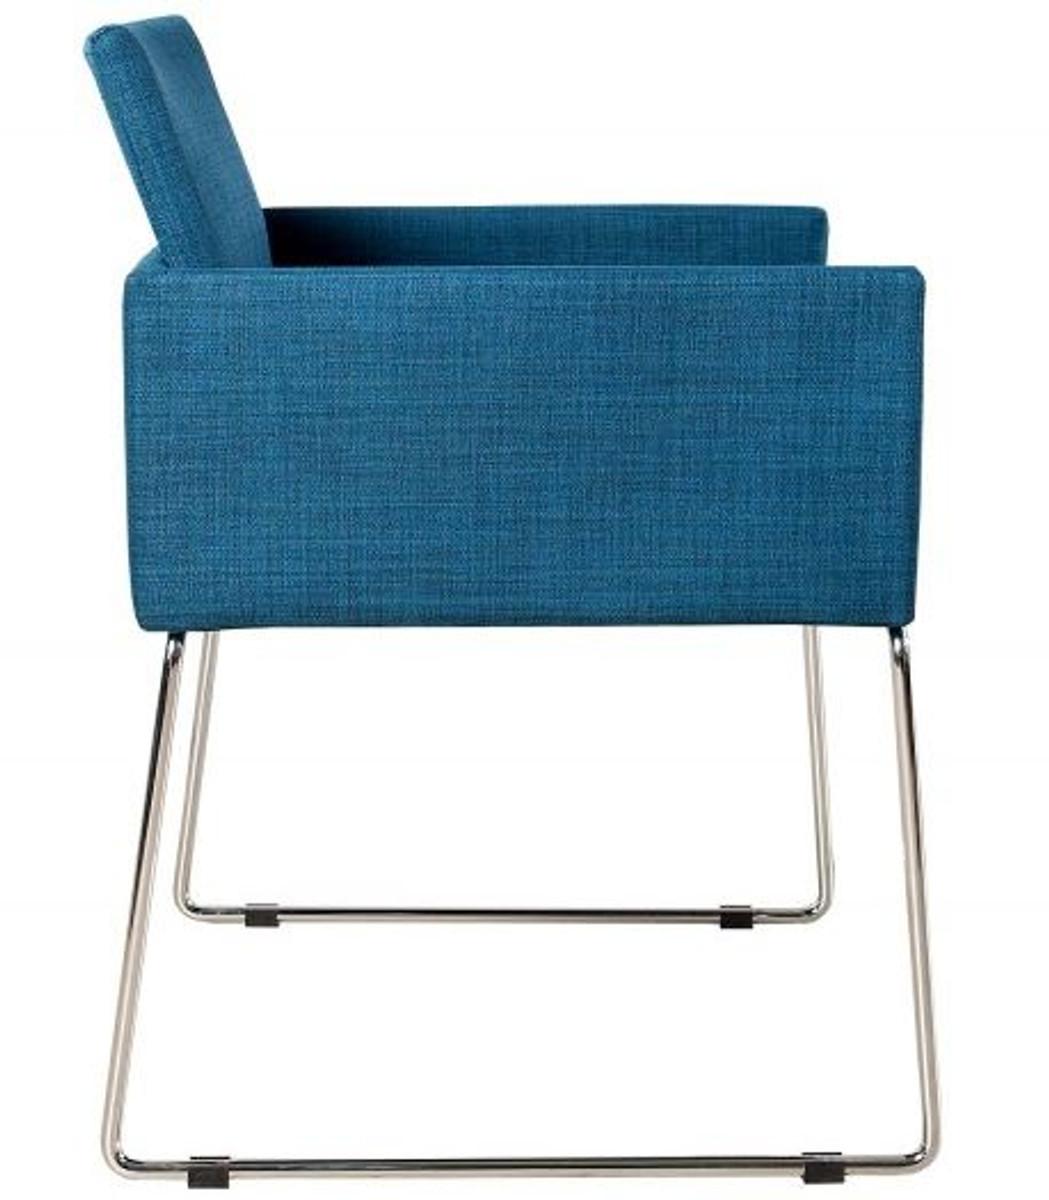 Casa Padrino Designer Stuhl Mit Armlehnen Blau 55cm X 80cm X 60cm